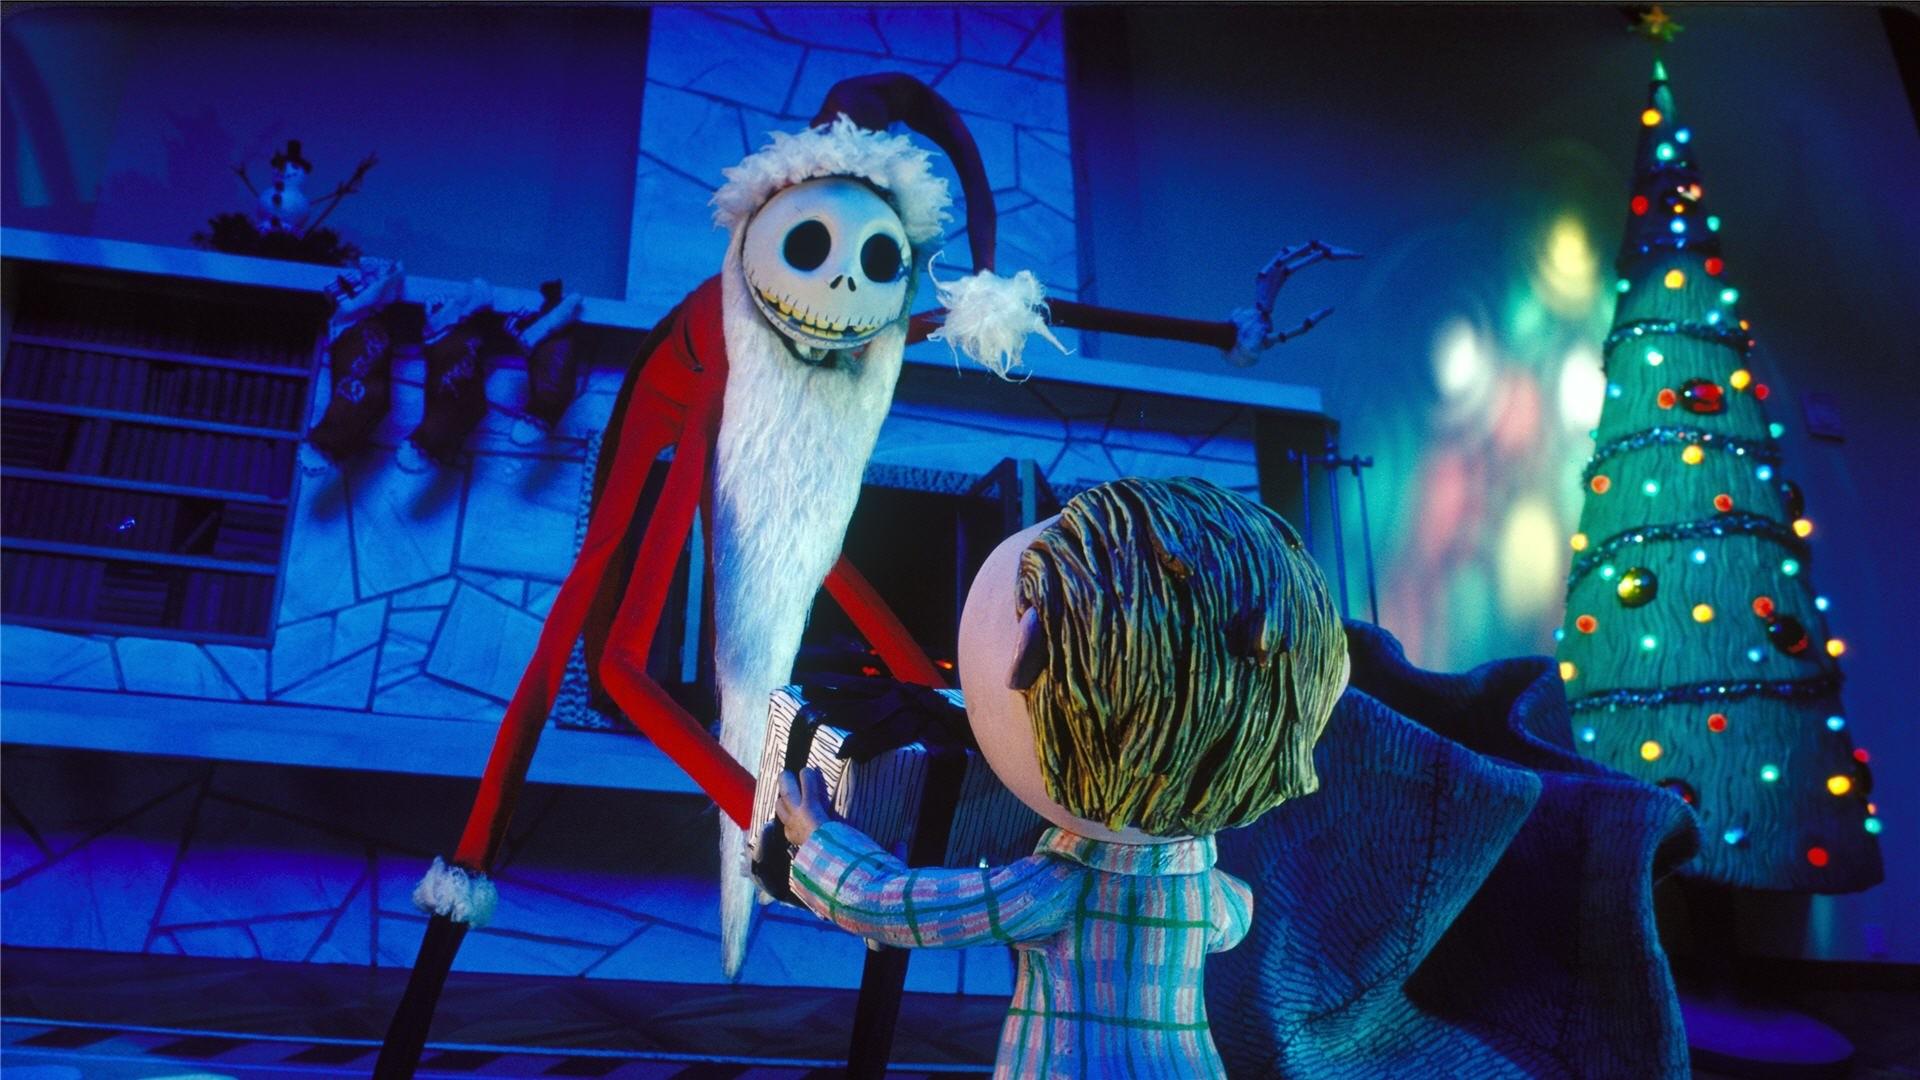 … Wallpapers Nightmare Before Christmas Jack 714120 …